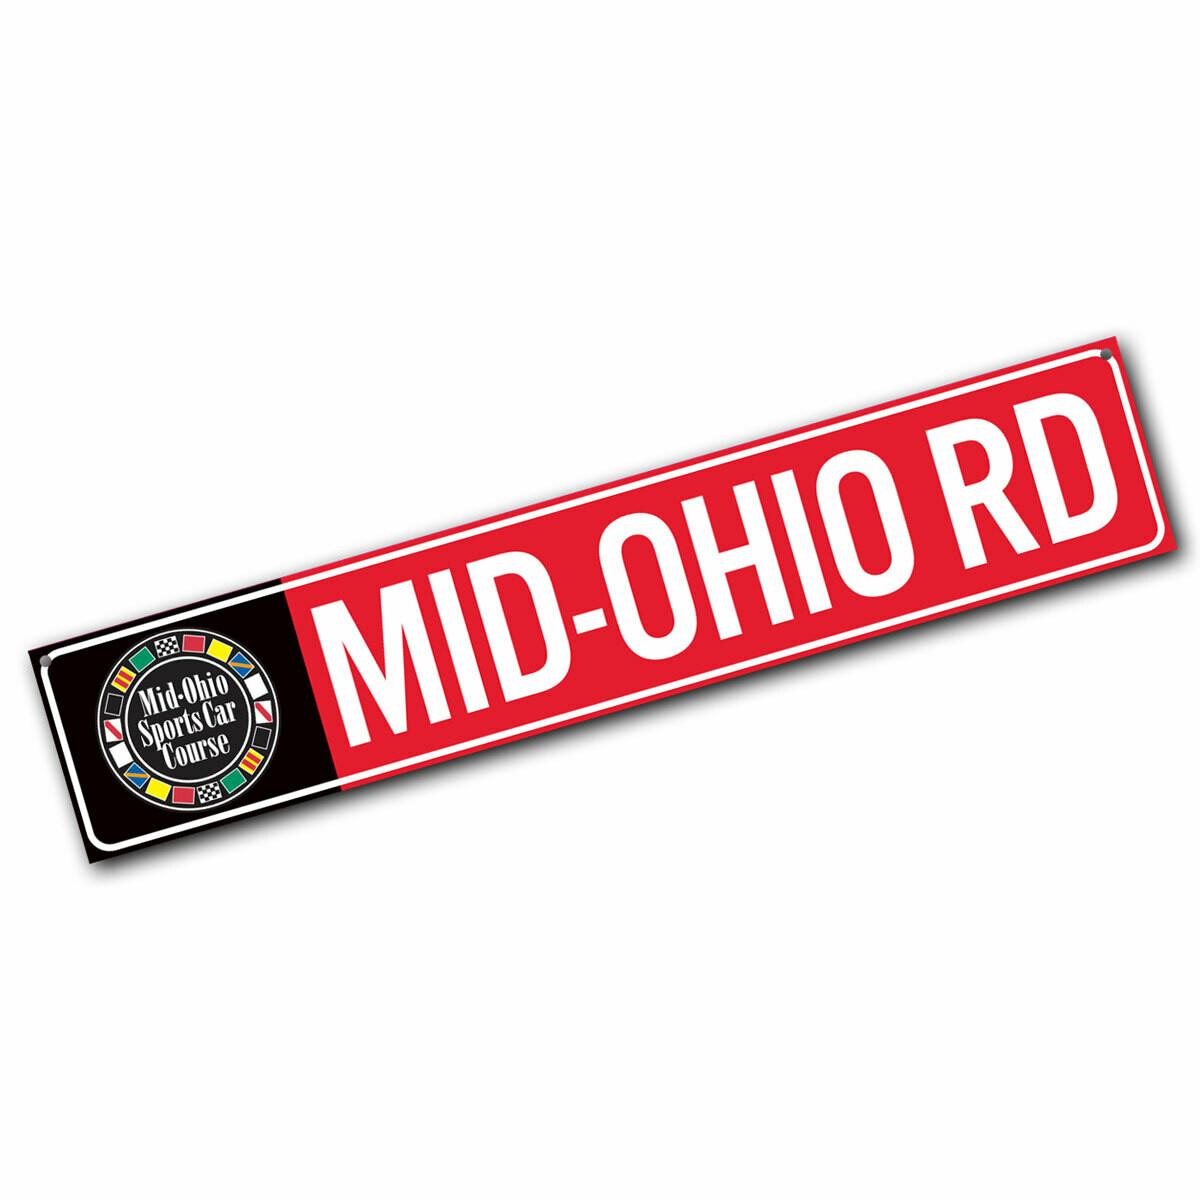 Street Sign - Mid-Ohio Rd